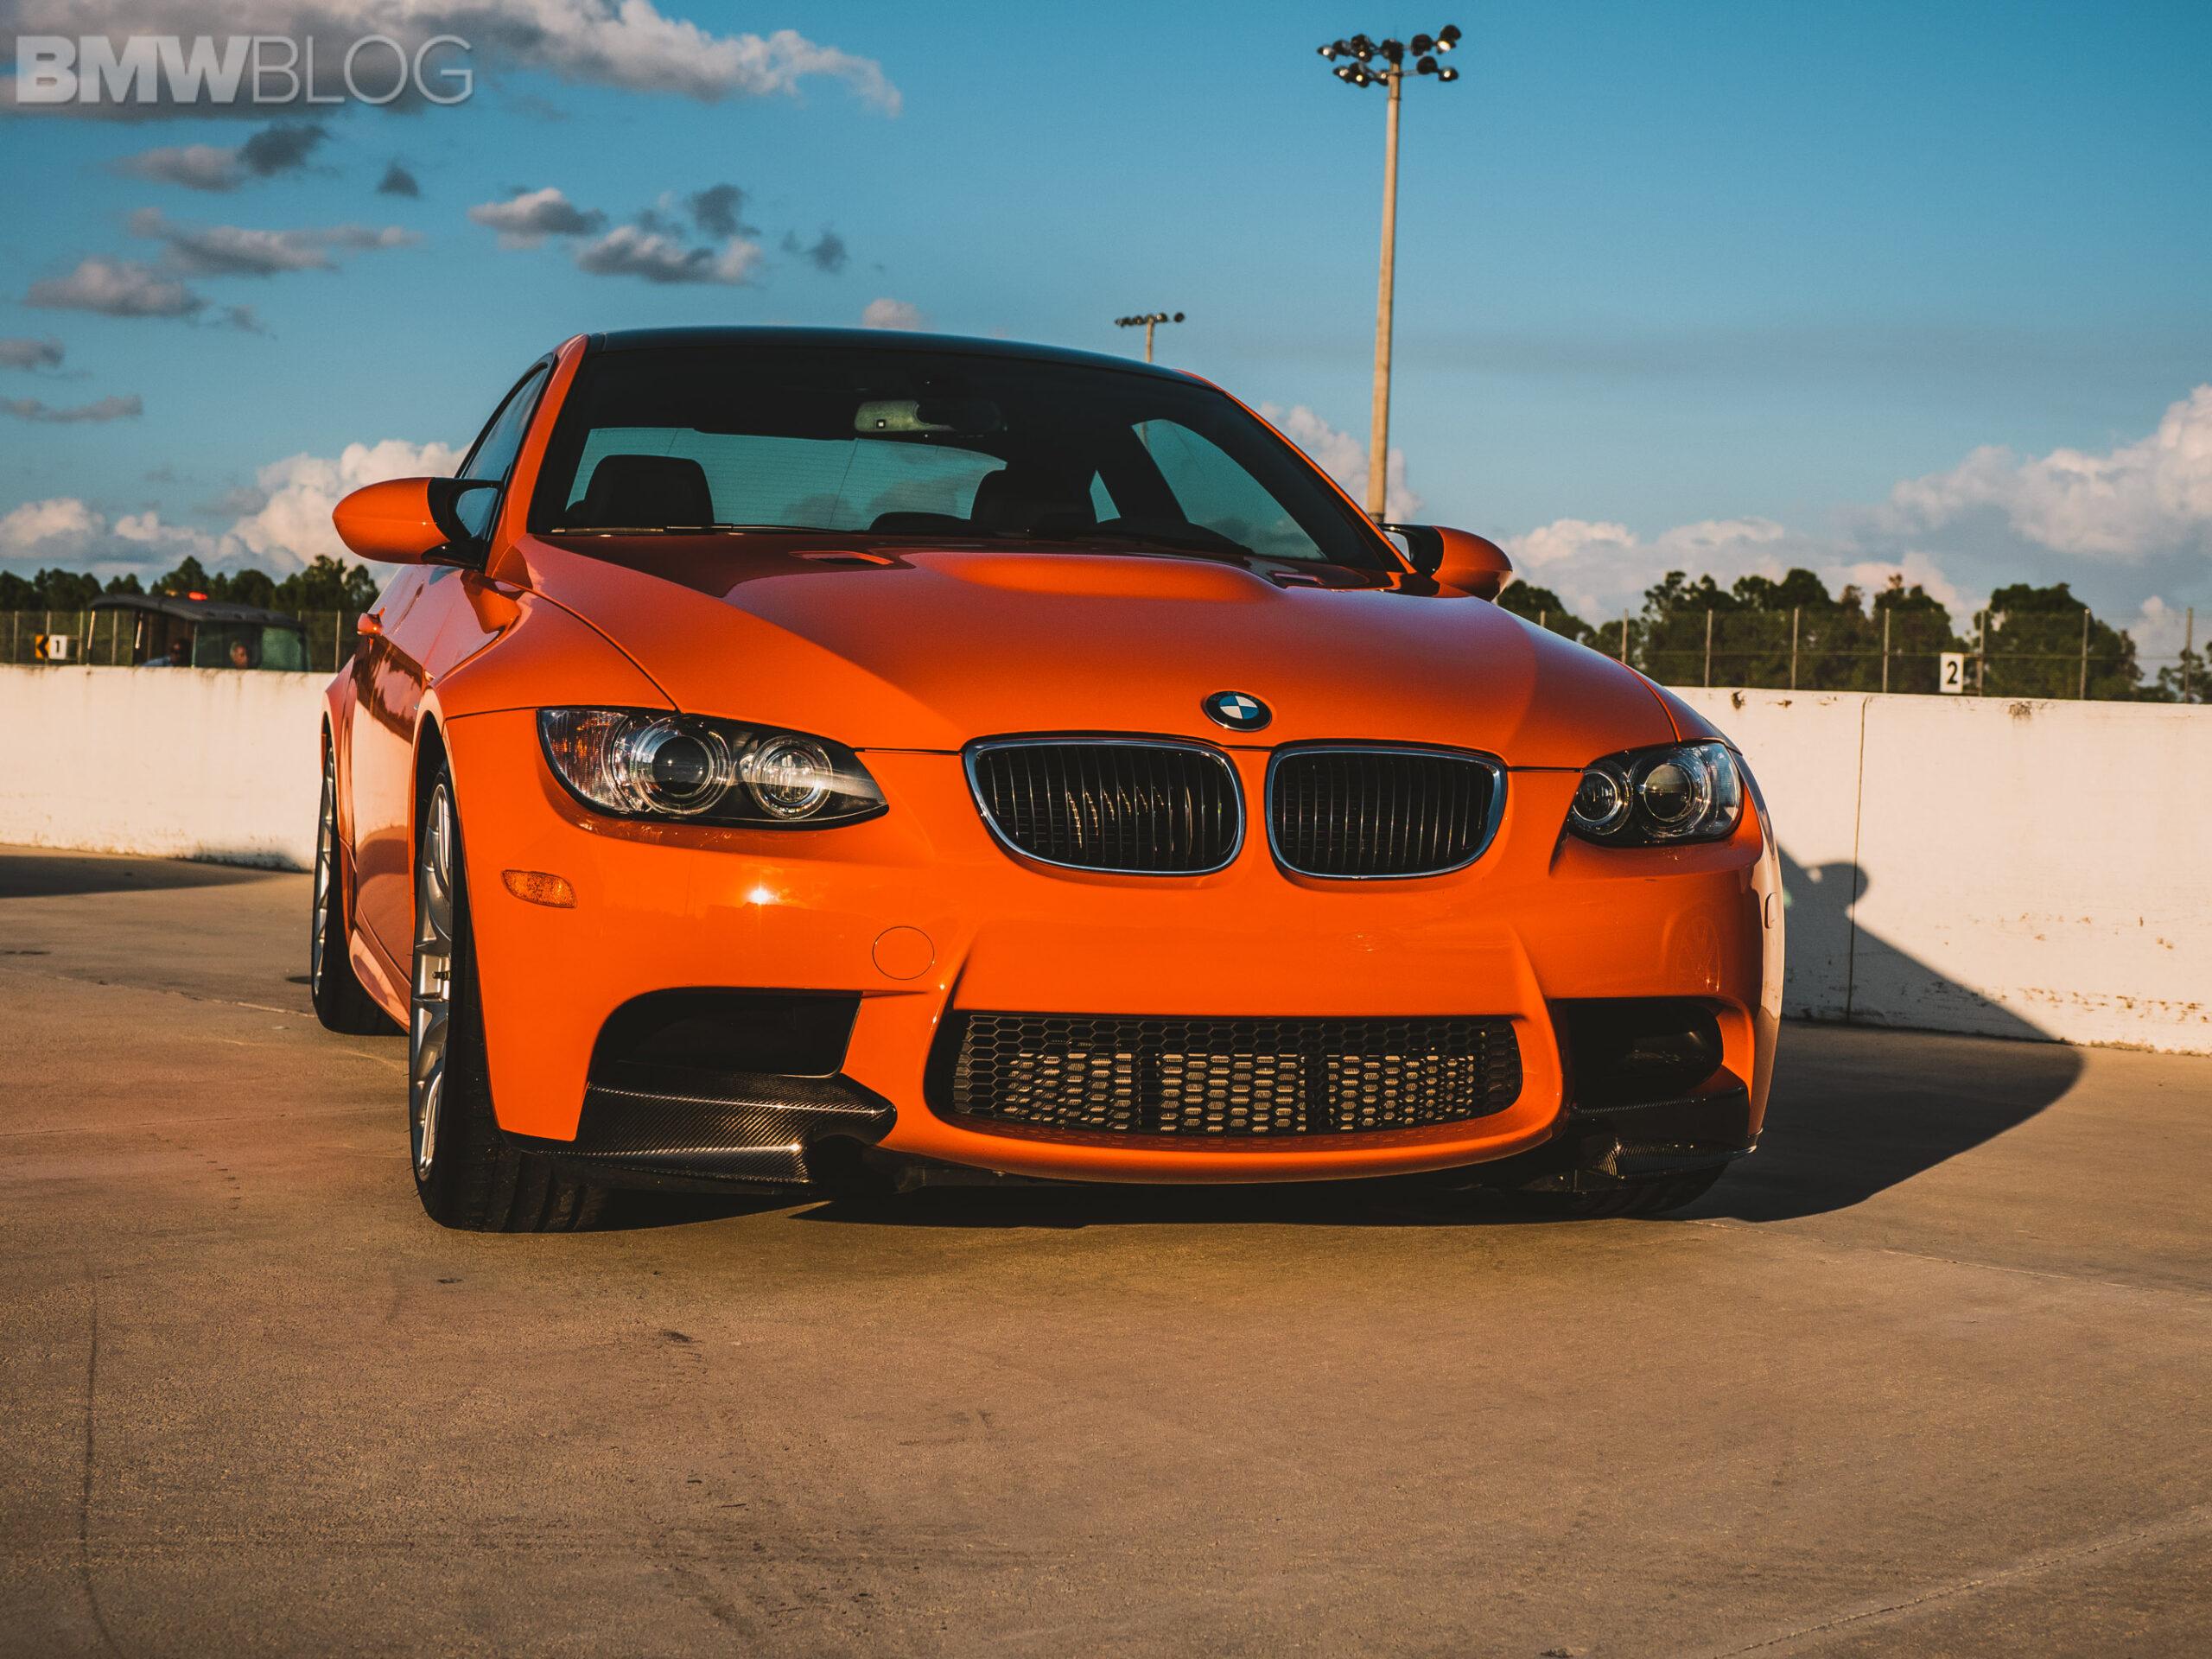 bmw m3 e92 fire orange 3 scaled